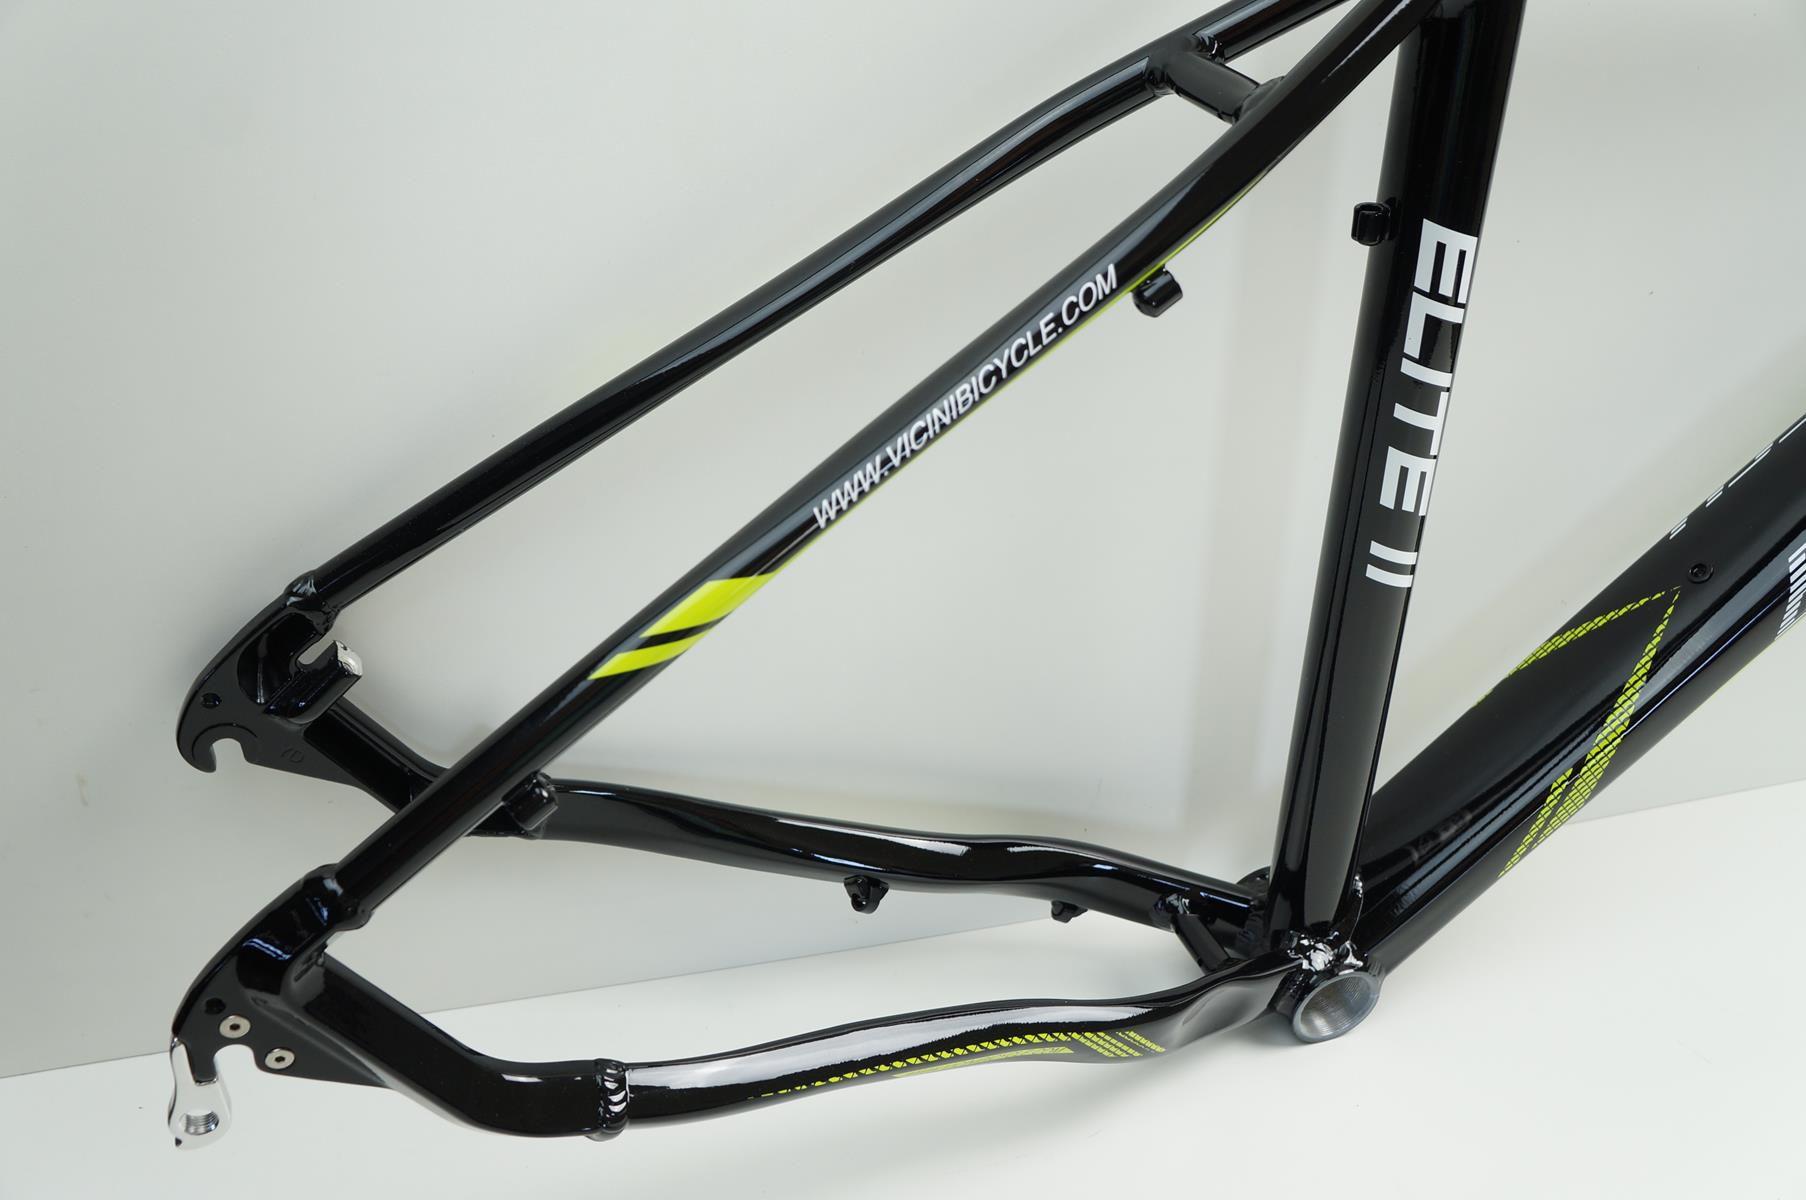 Quadro Bicicleta MTB Ballistech Elite II Aro 29 Preto Brilhante em Aluminio 2019